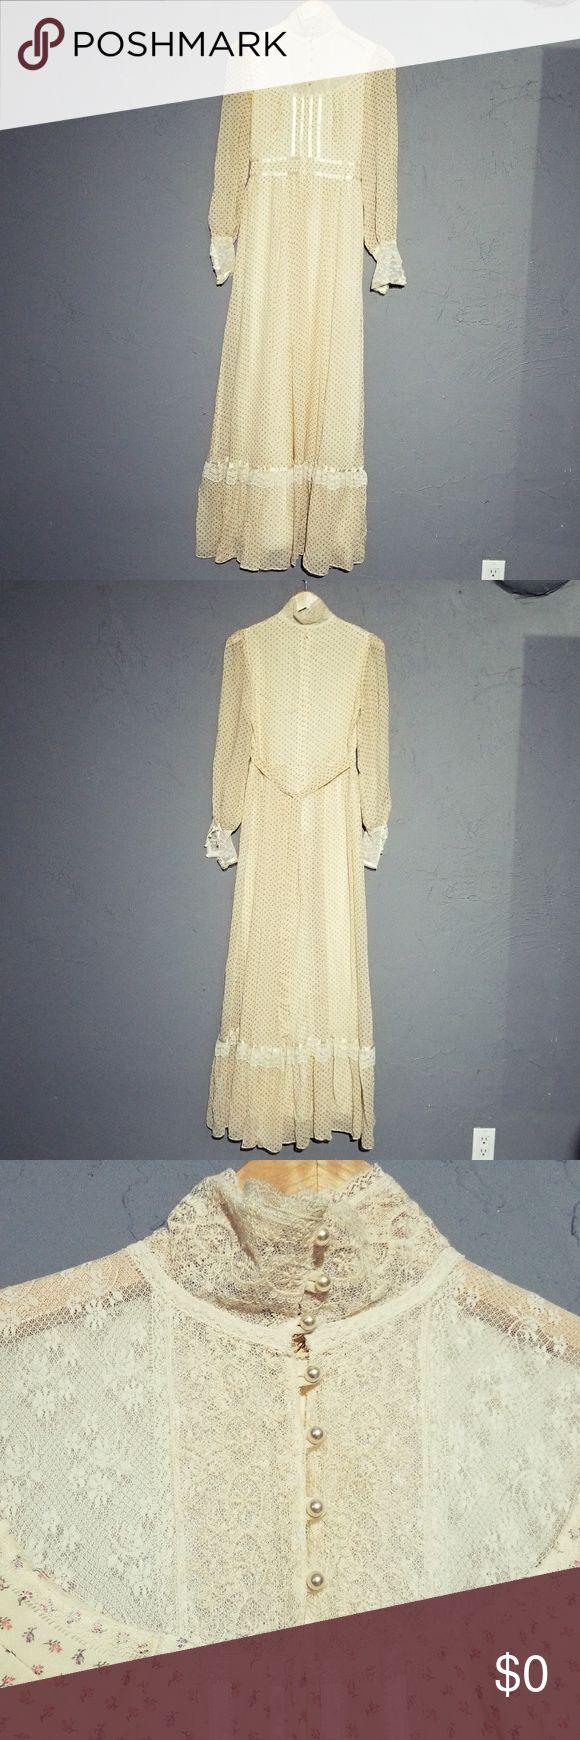 I just added this listing on Poshmark: Gunne Sax by Jessica Yellow Prairie Dress c 1970's. #shopmycloset #poshmark #fashion #shopping #style #forsale #Gunne Sax #Dresses & Skirts